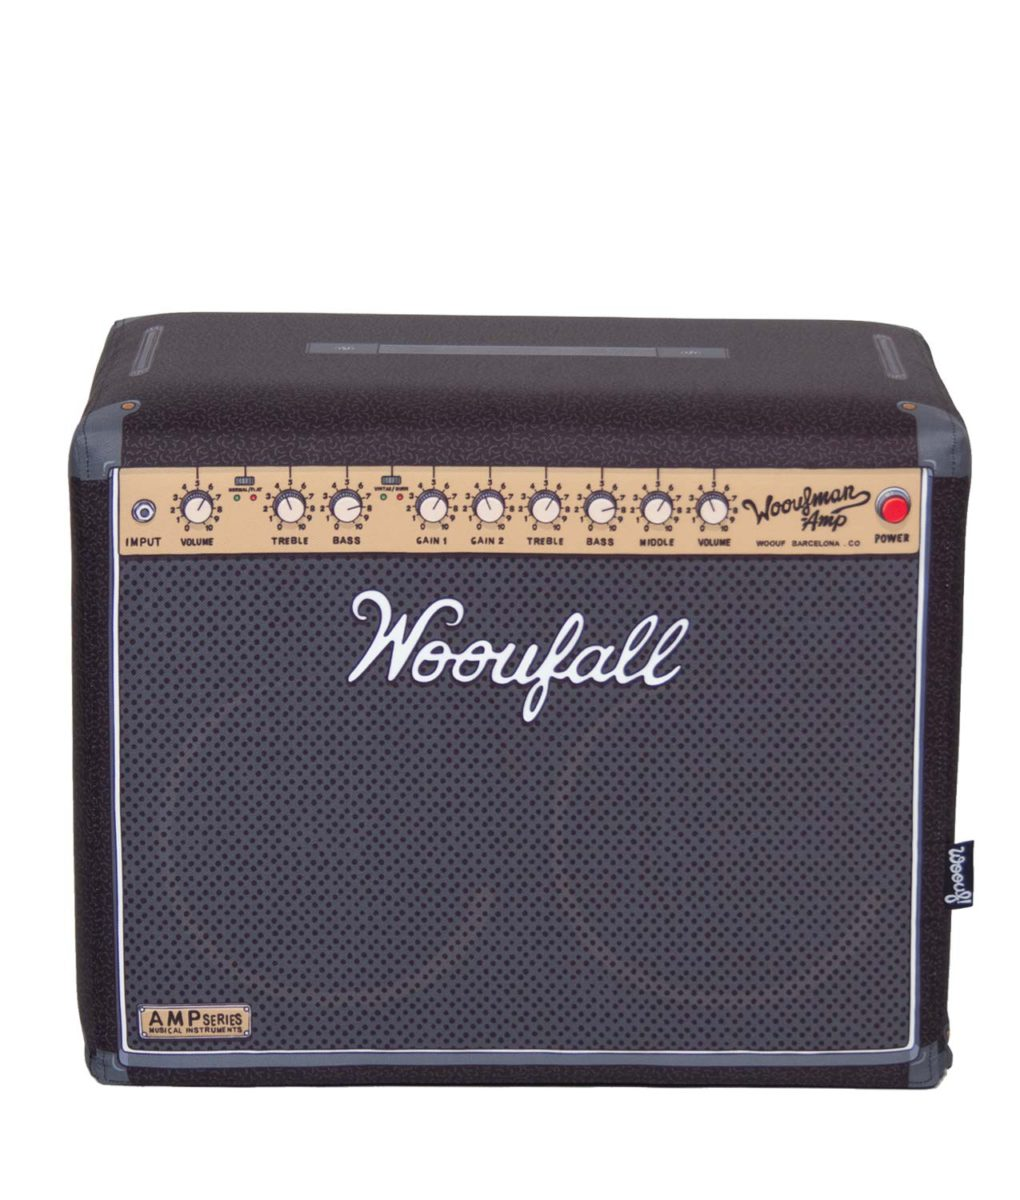 WOUFALL-woouf